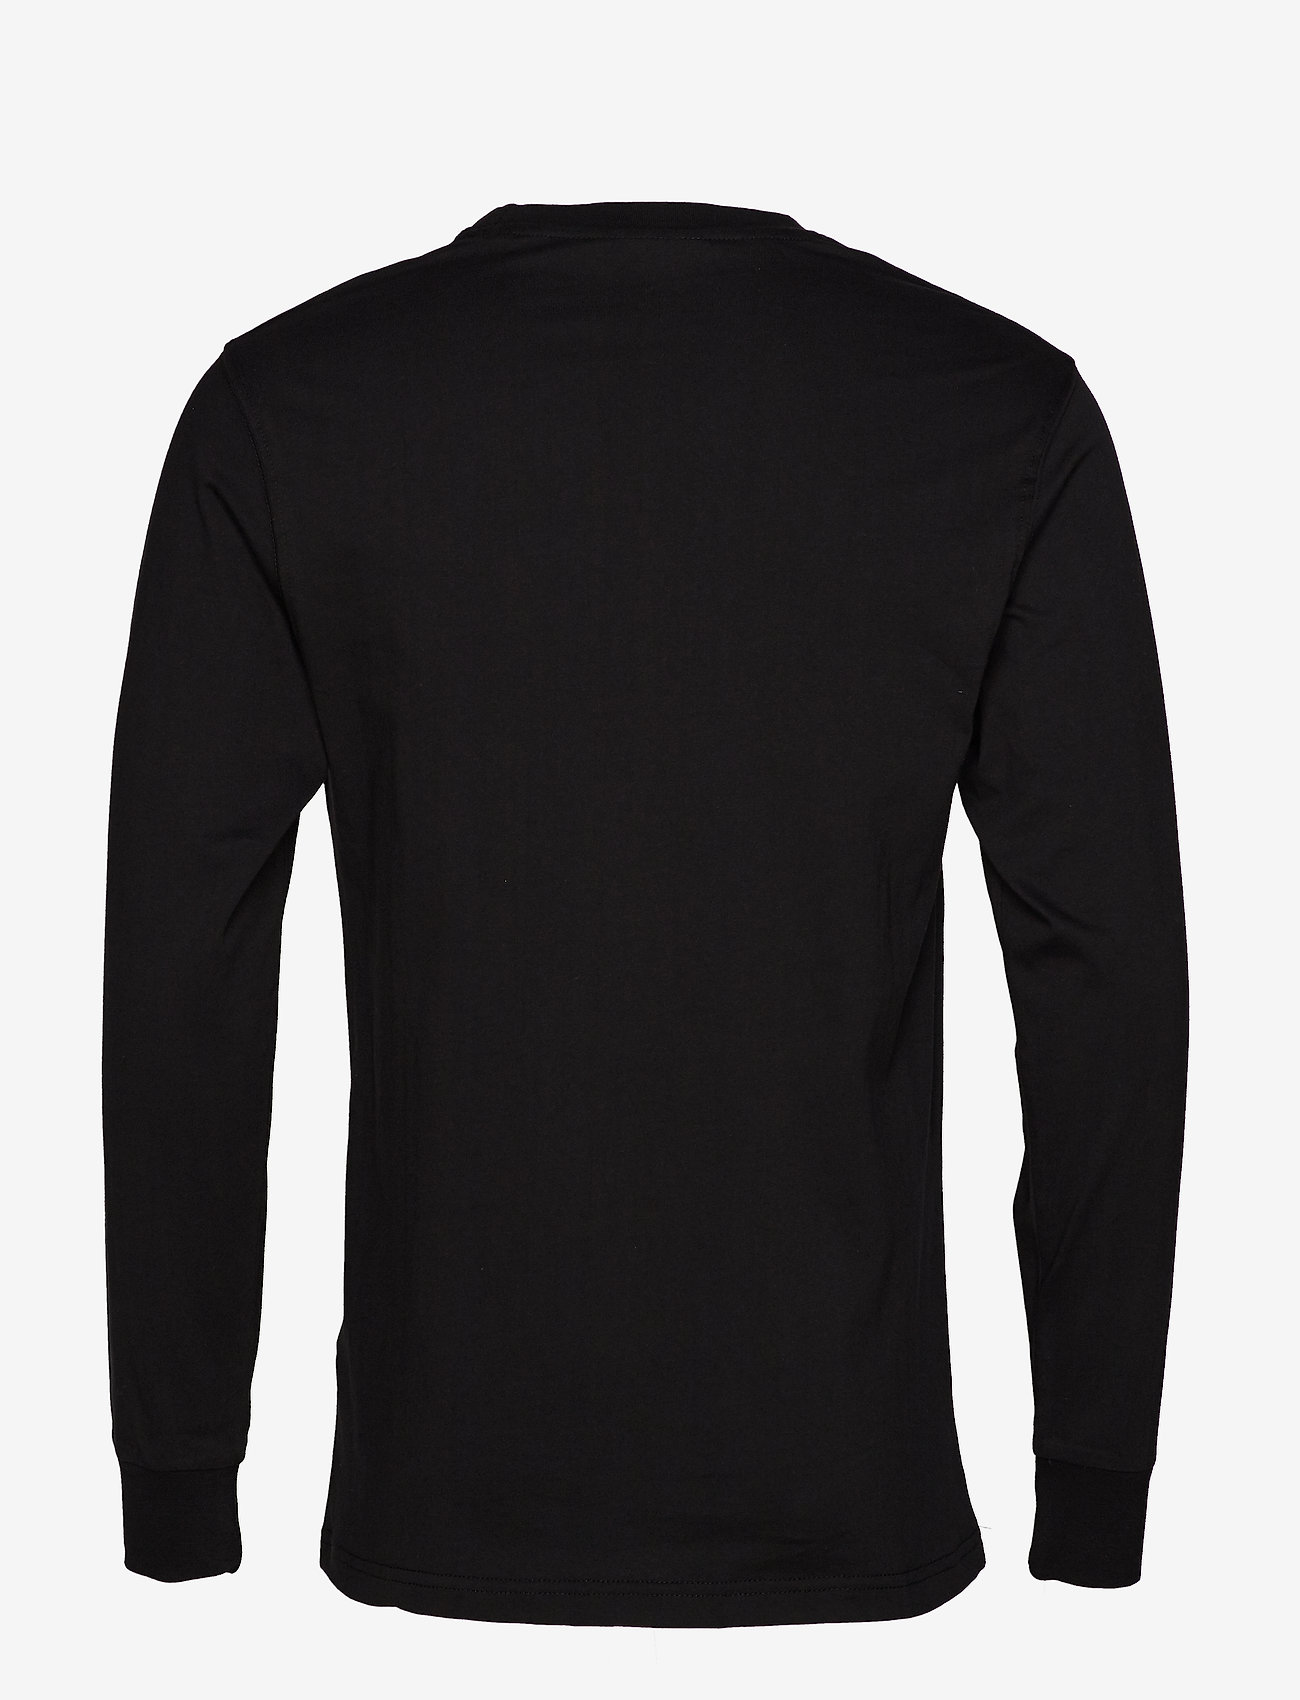 HAN Kjøbenhavn - Casual Long Sleeve Tee - basic t-shirts - black logo - 2